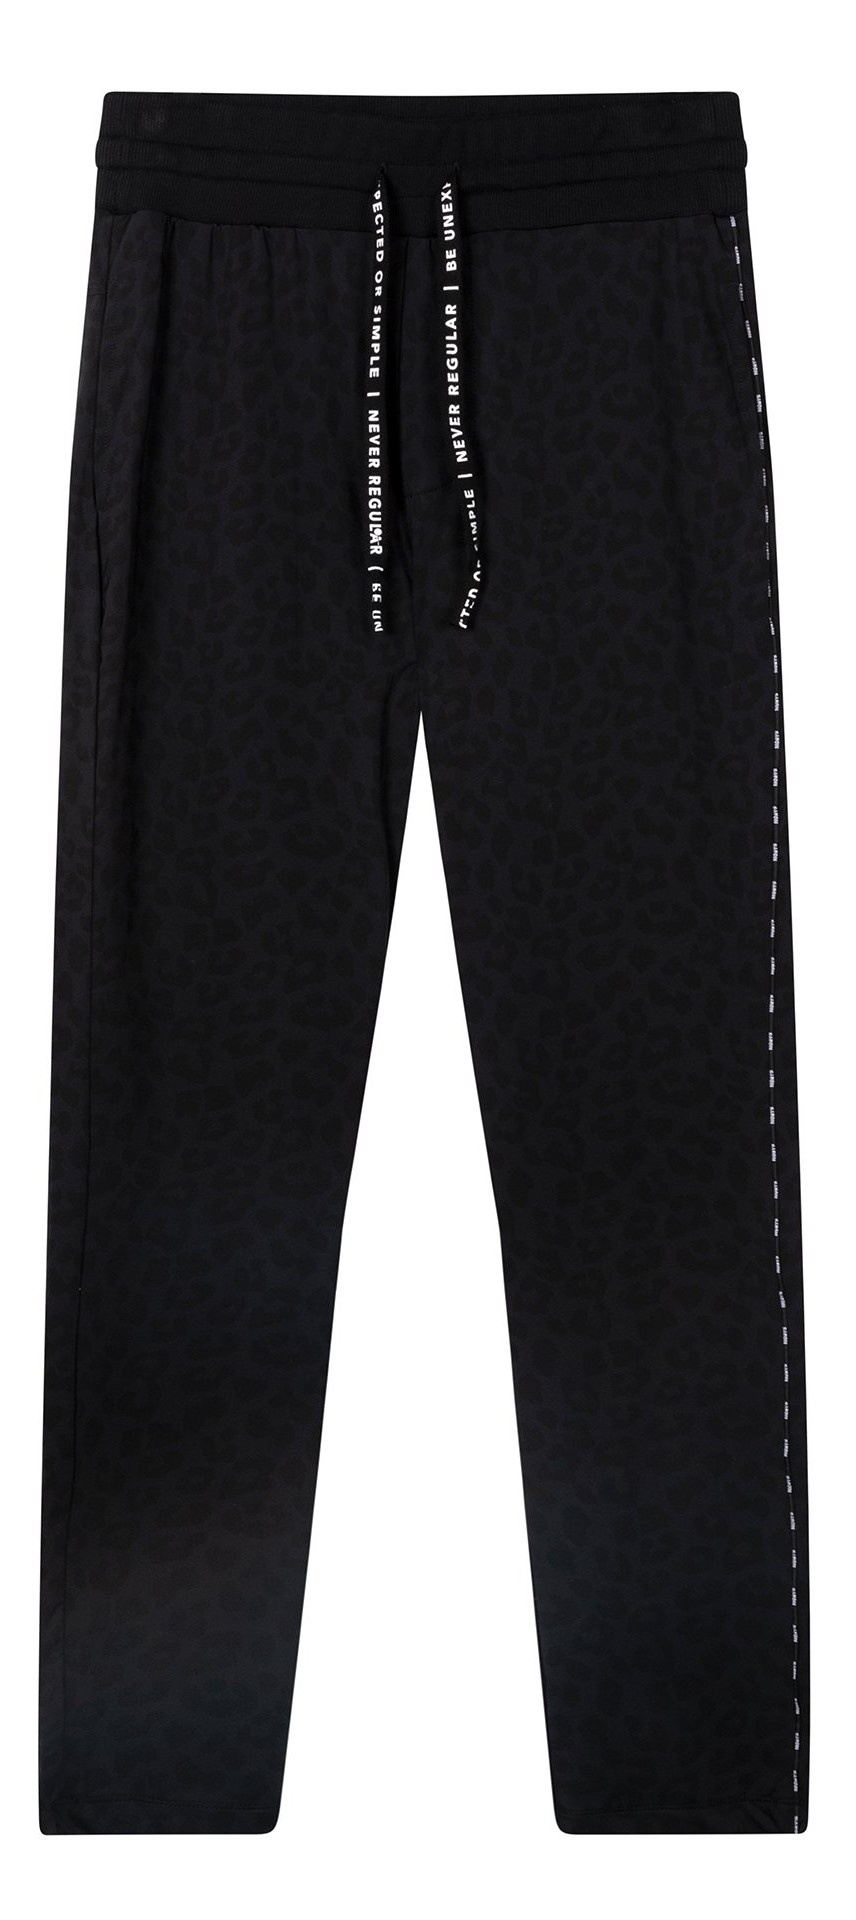 Broek banana pants leopard black-1